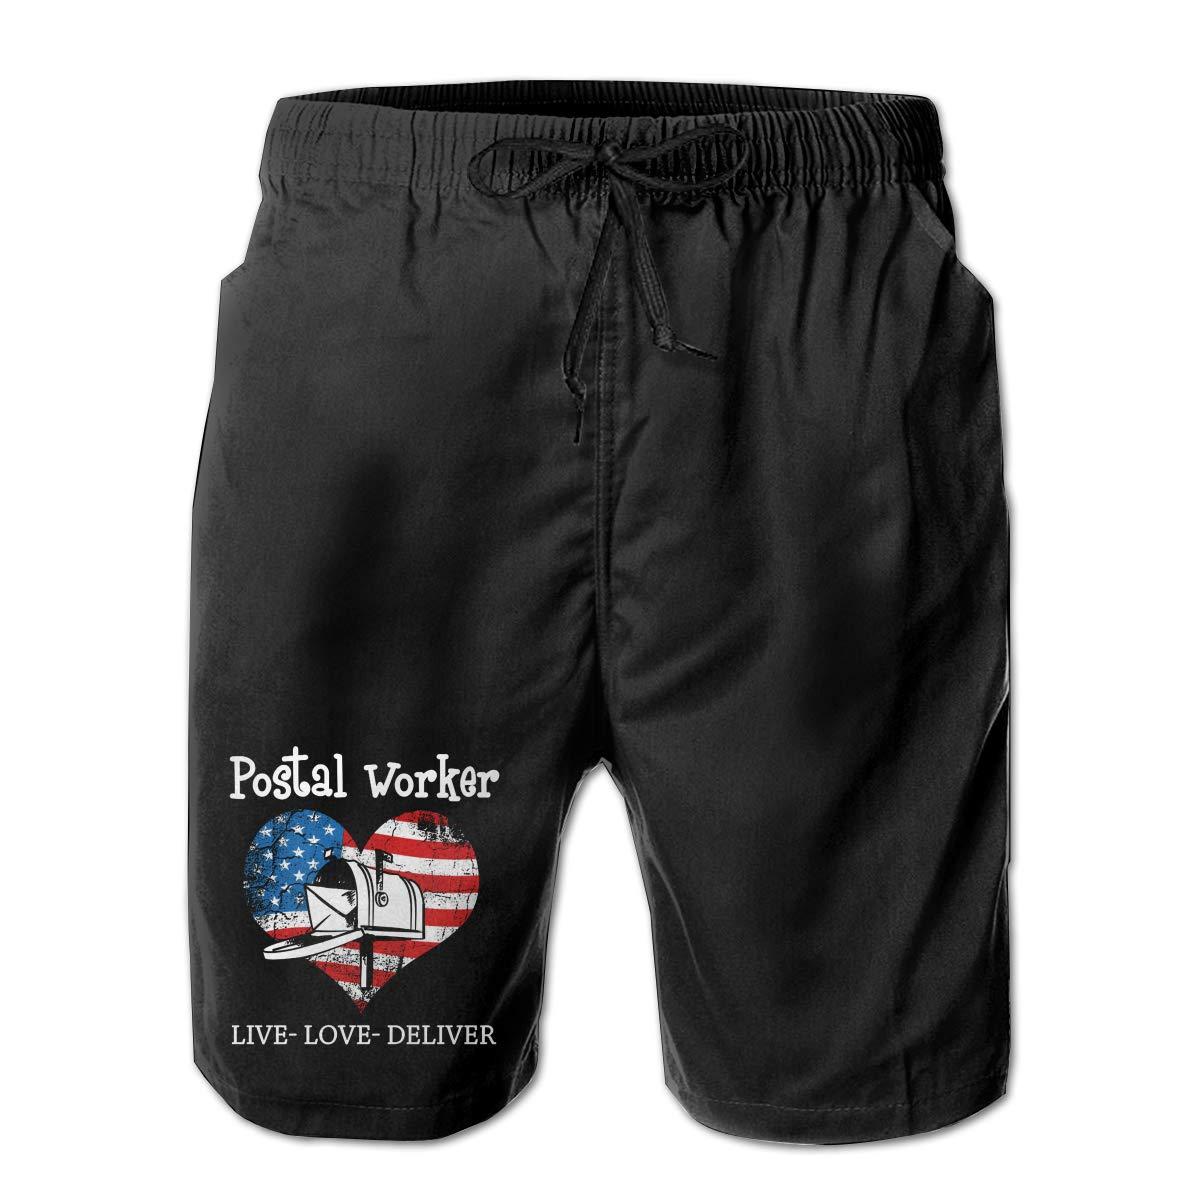 Monwe Postal Worker US Flag Mens Summer Casual Shorts,Beach Shorts Board Shorts